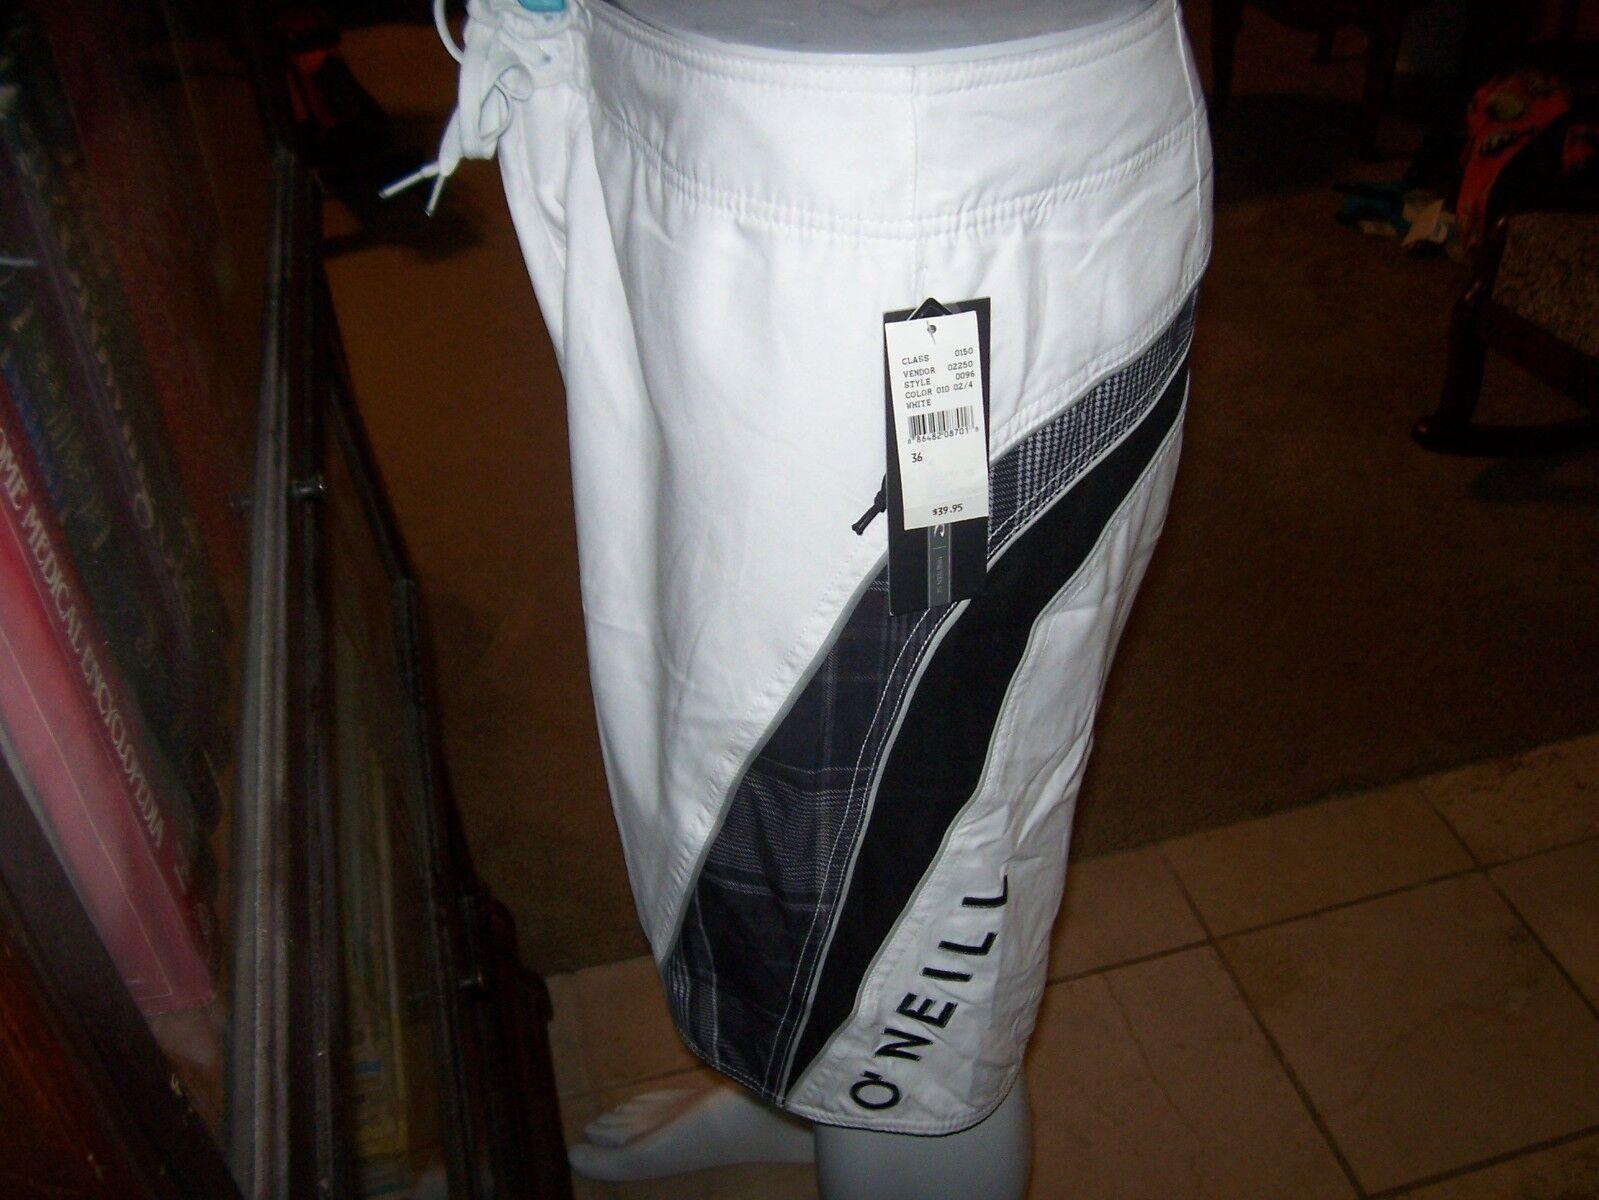 New O'NEILL board shorts swim trunk white plaid boardshorts Santa Cruz 30 or 31